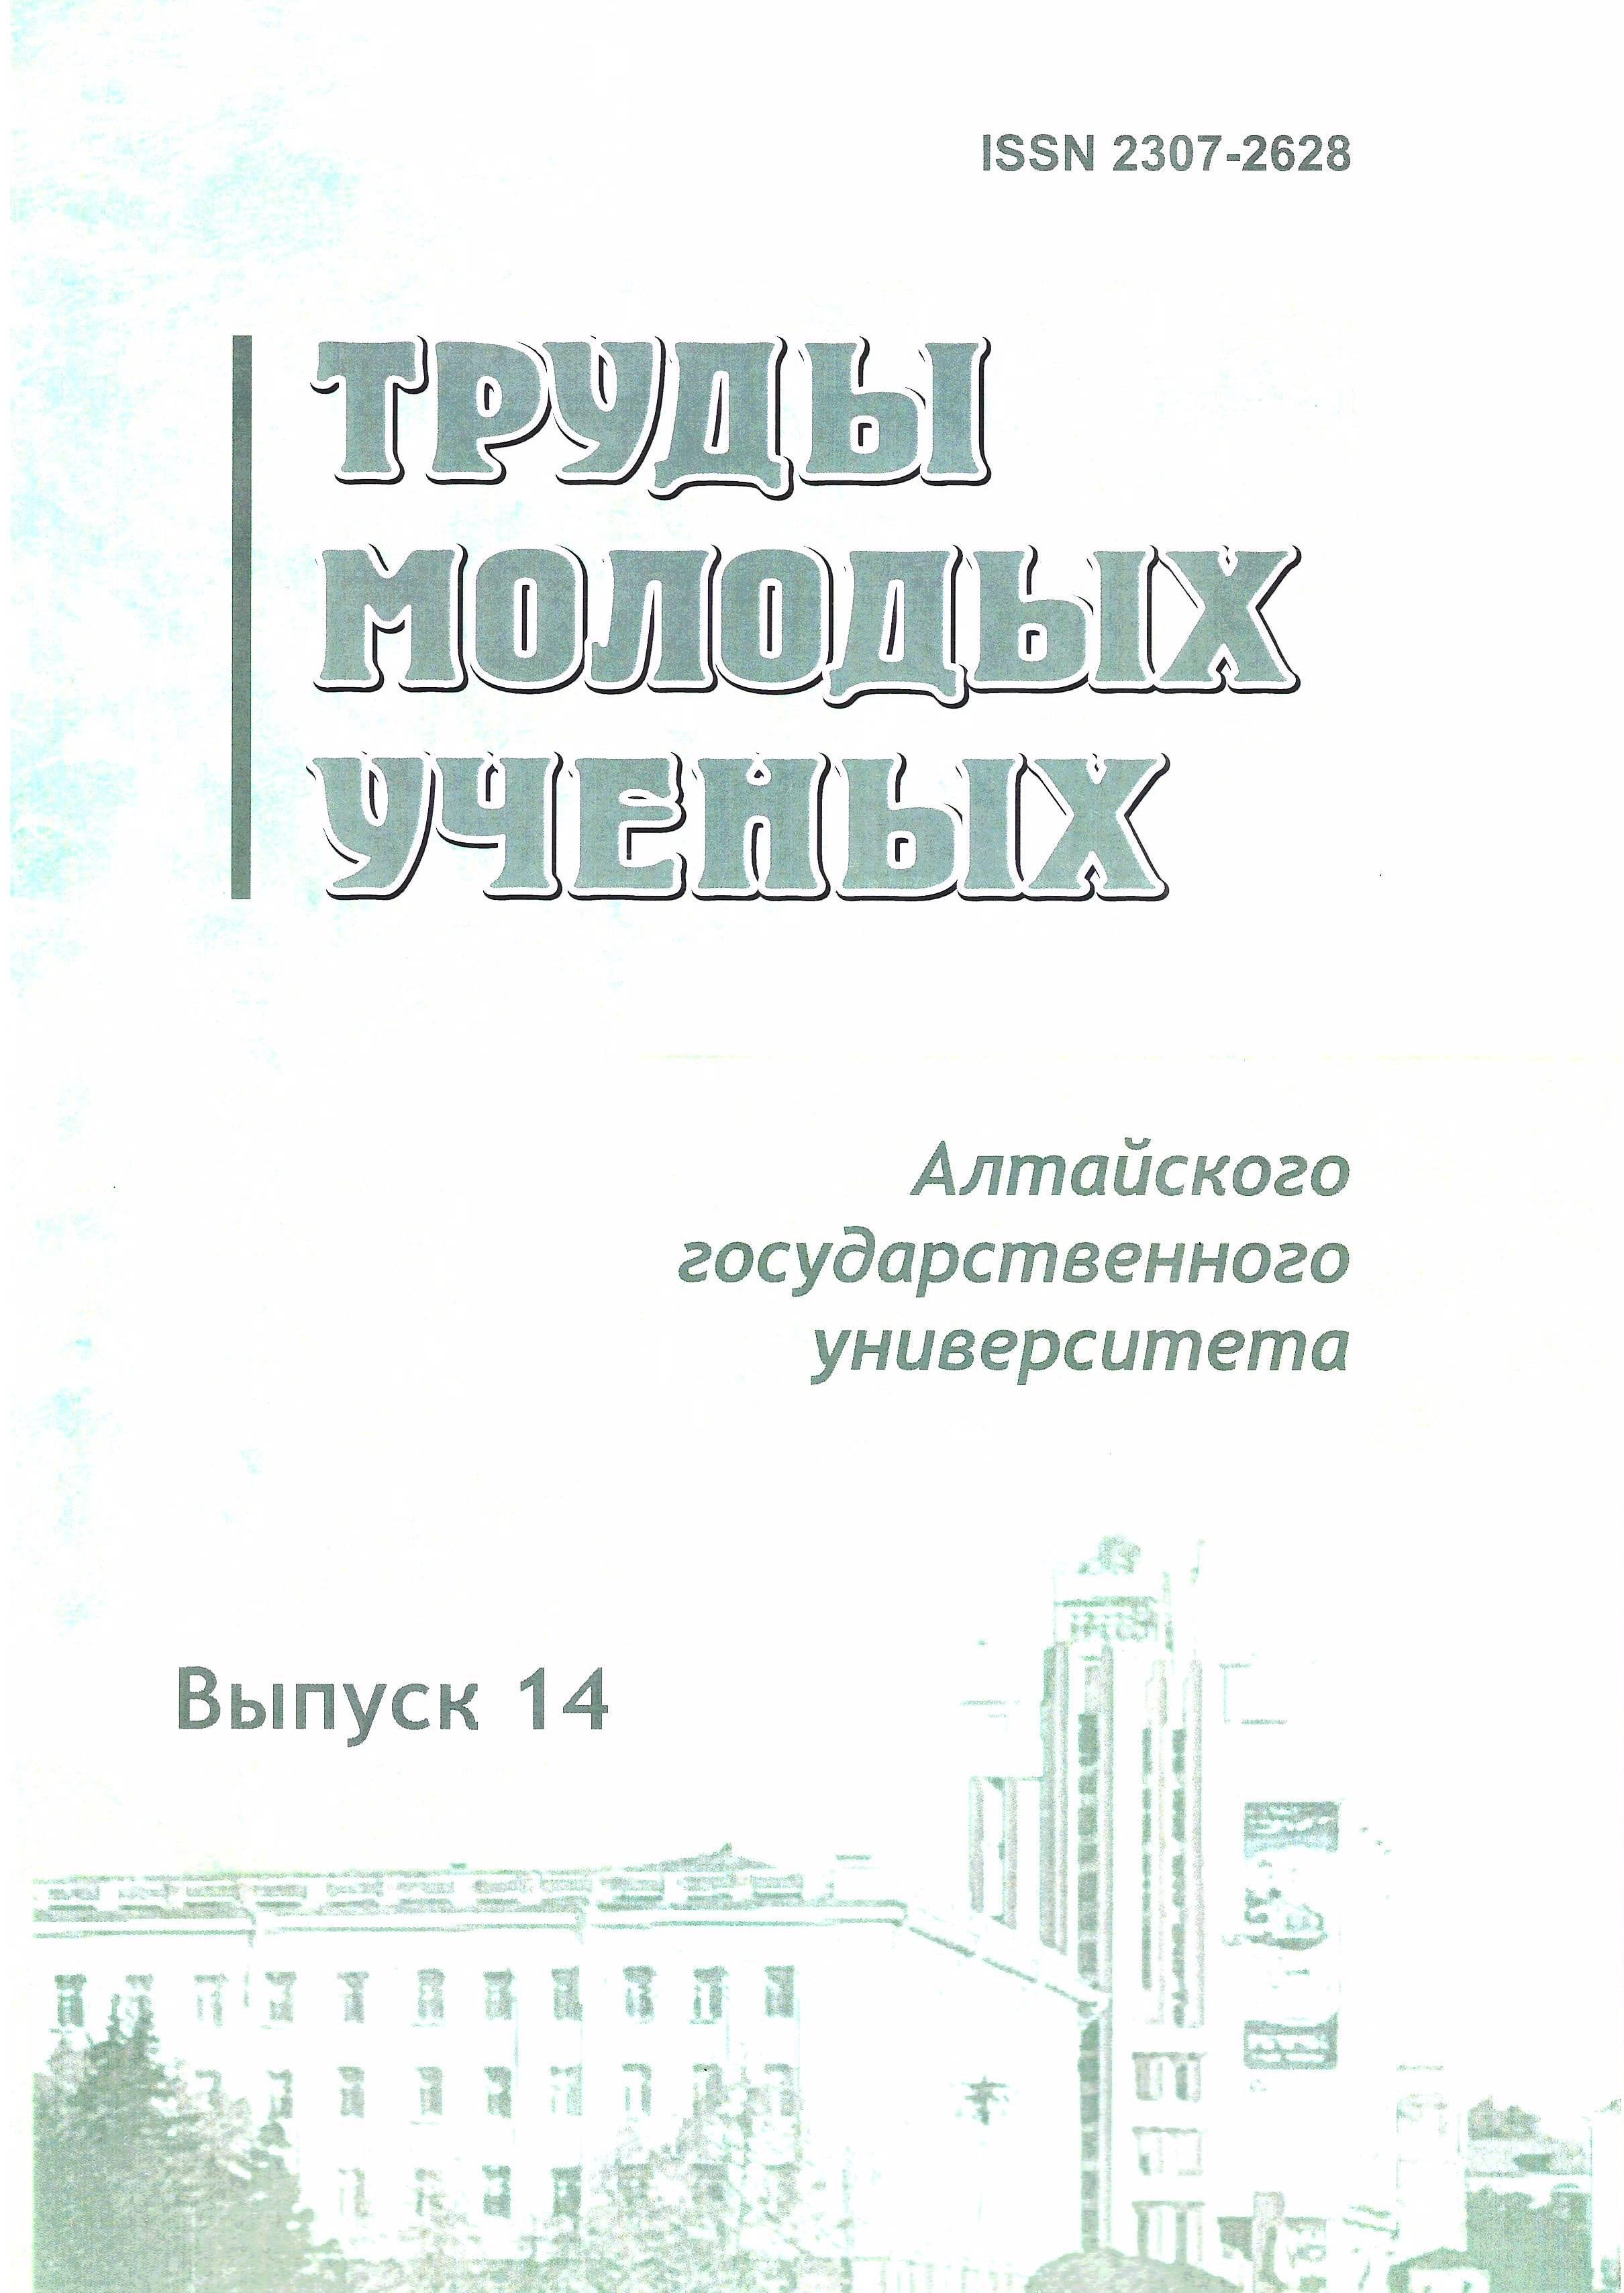 Труды молодых ученых выпуск 14